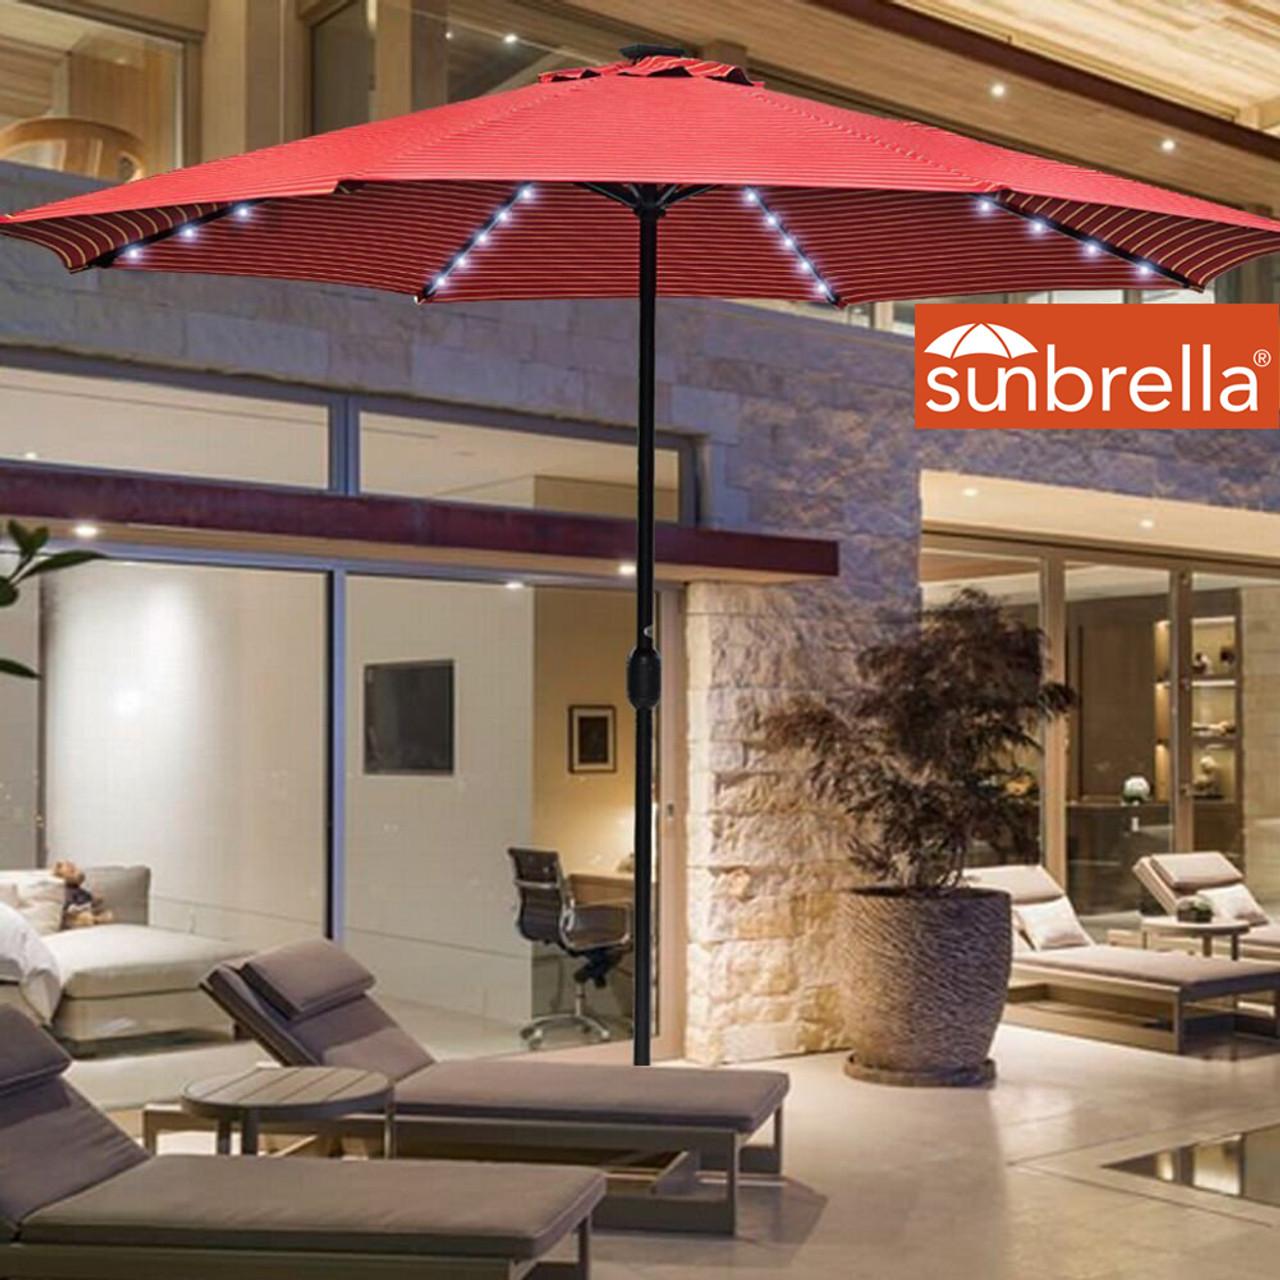 Sundale Outdoor 10 Ft Sunbrella® Canopy Solar Powered 72 LED Lighted Patio Market Umbrella Garden & Solar Powered 32 LED Lighted Outdoor Patio Umbrella with Crank and ...